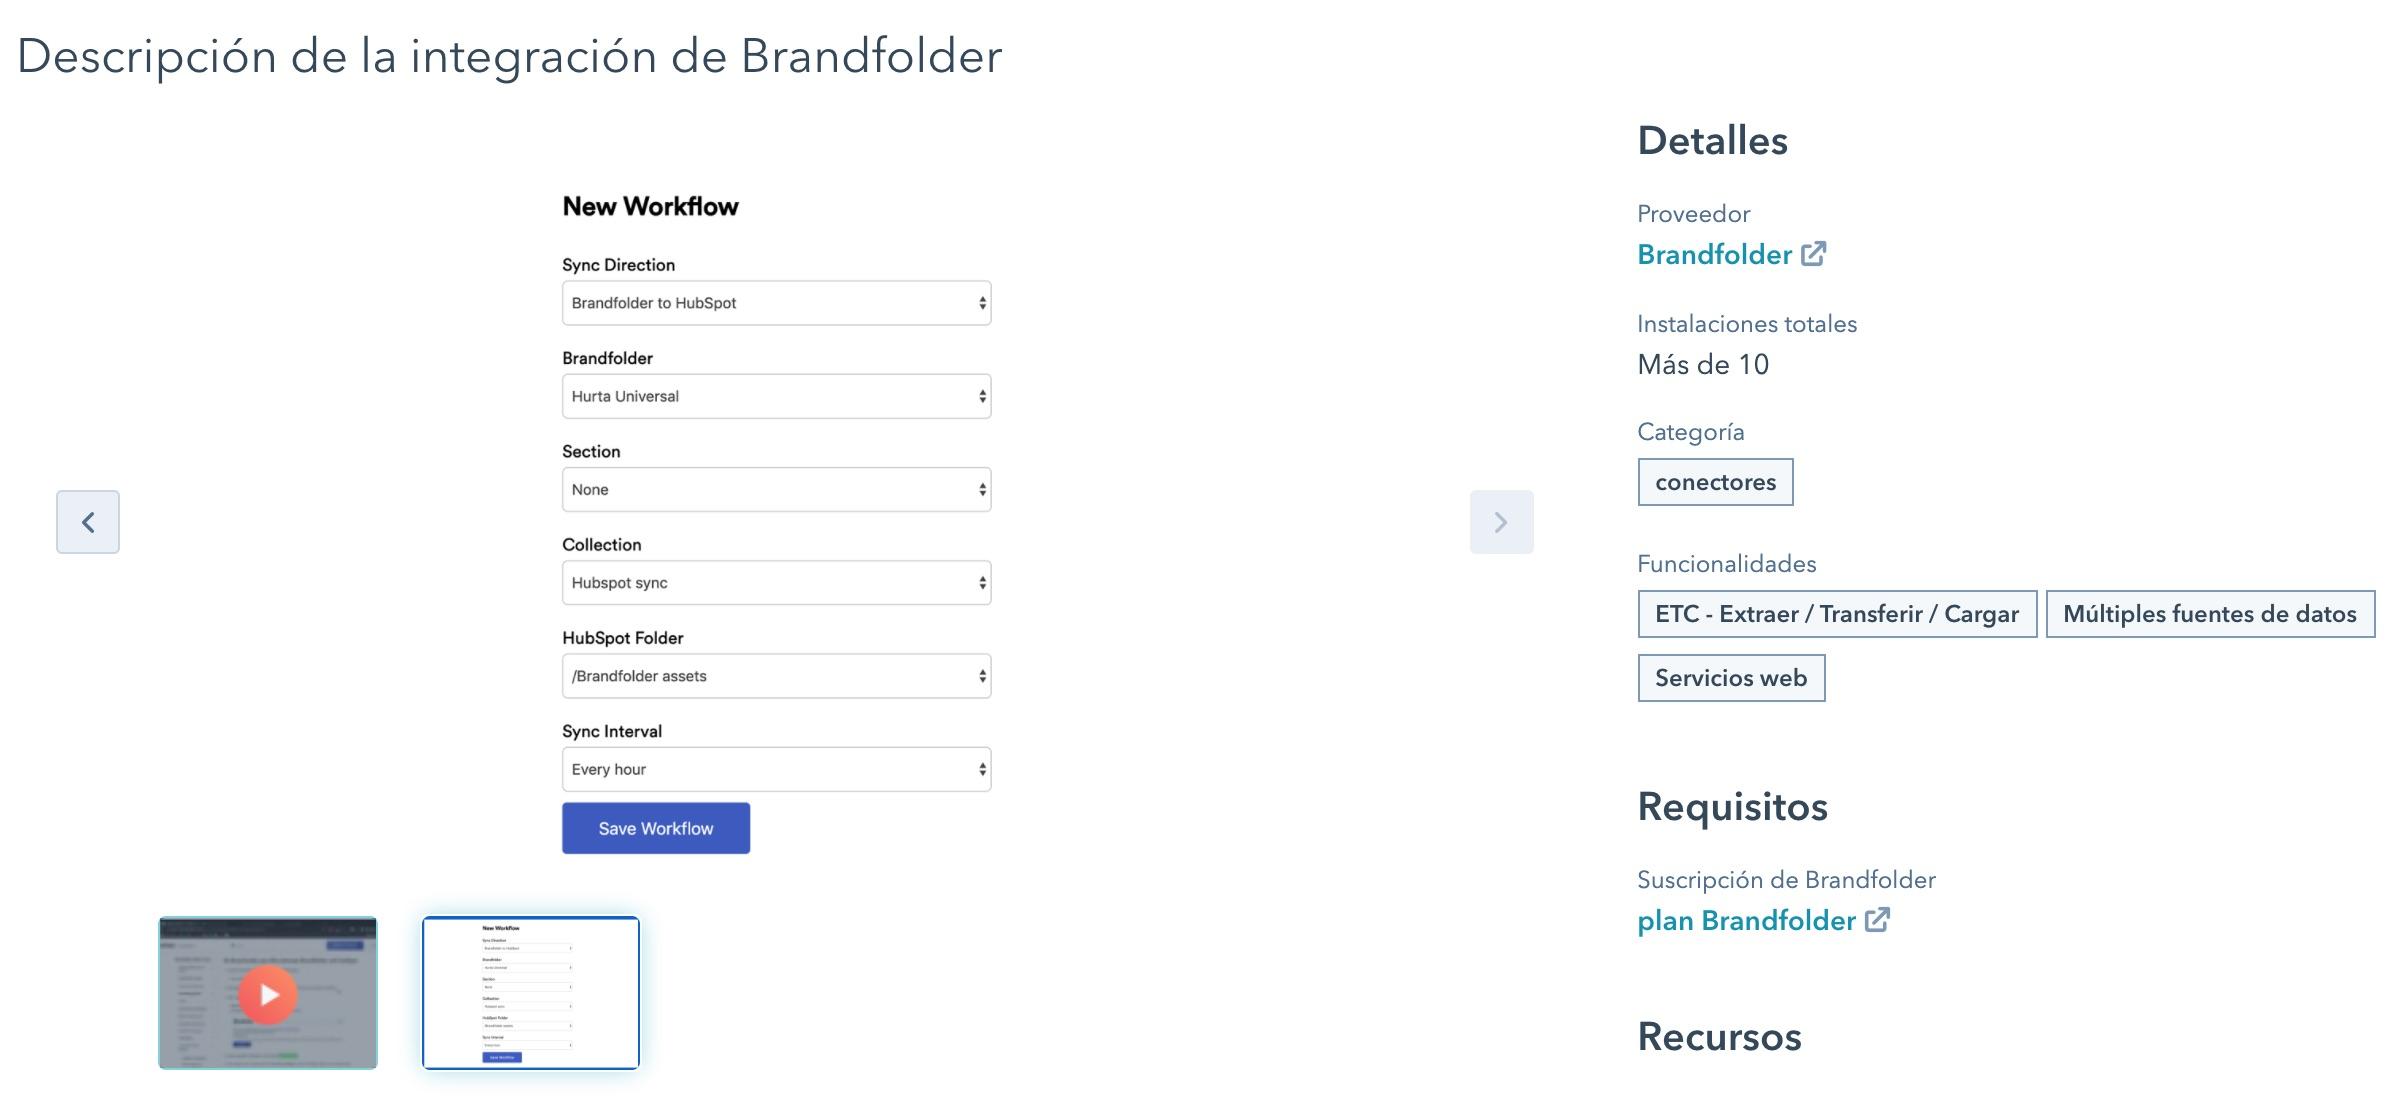 Software de brand management: Brandfolder